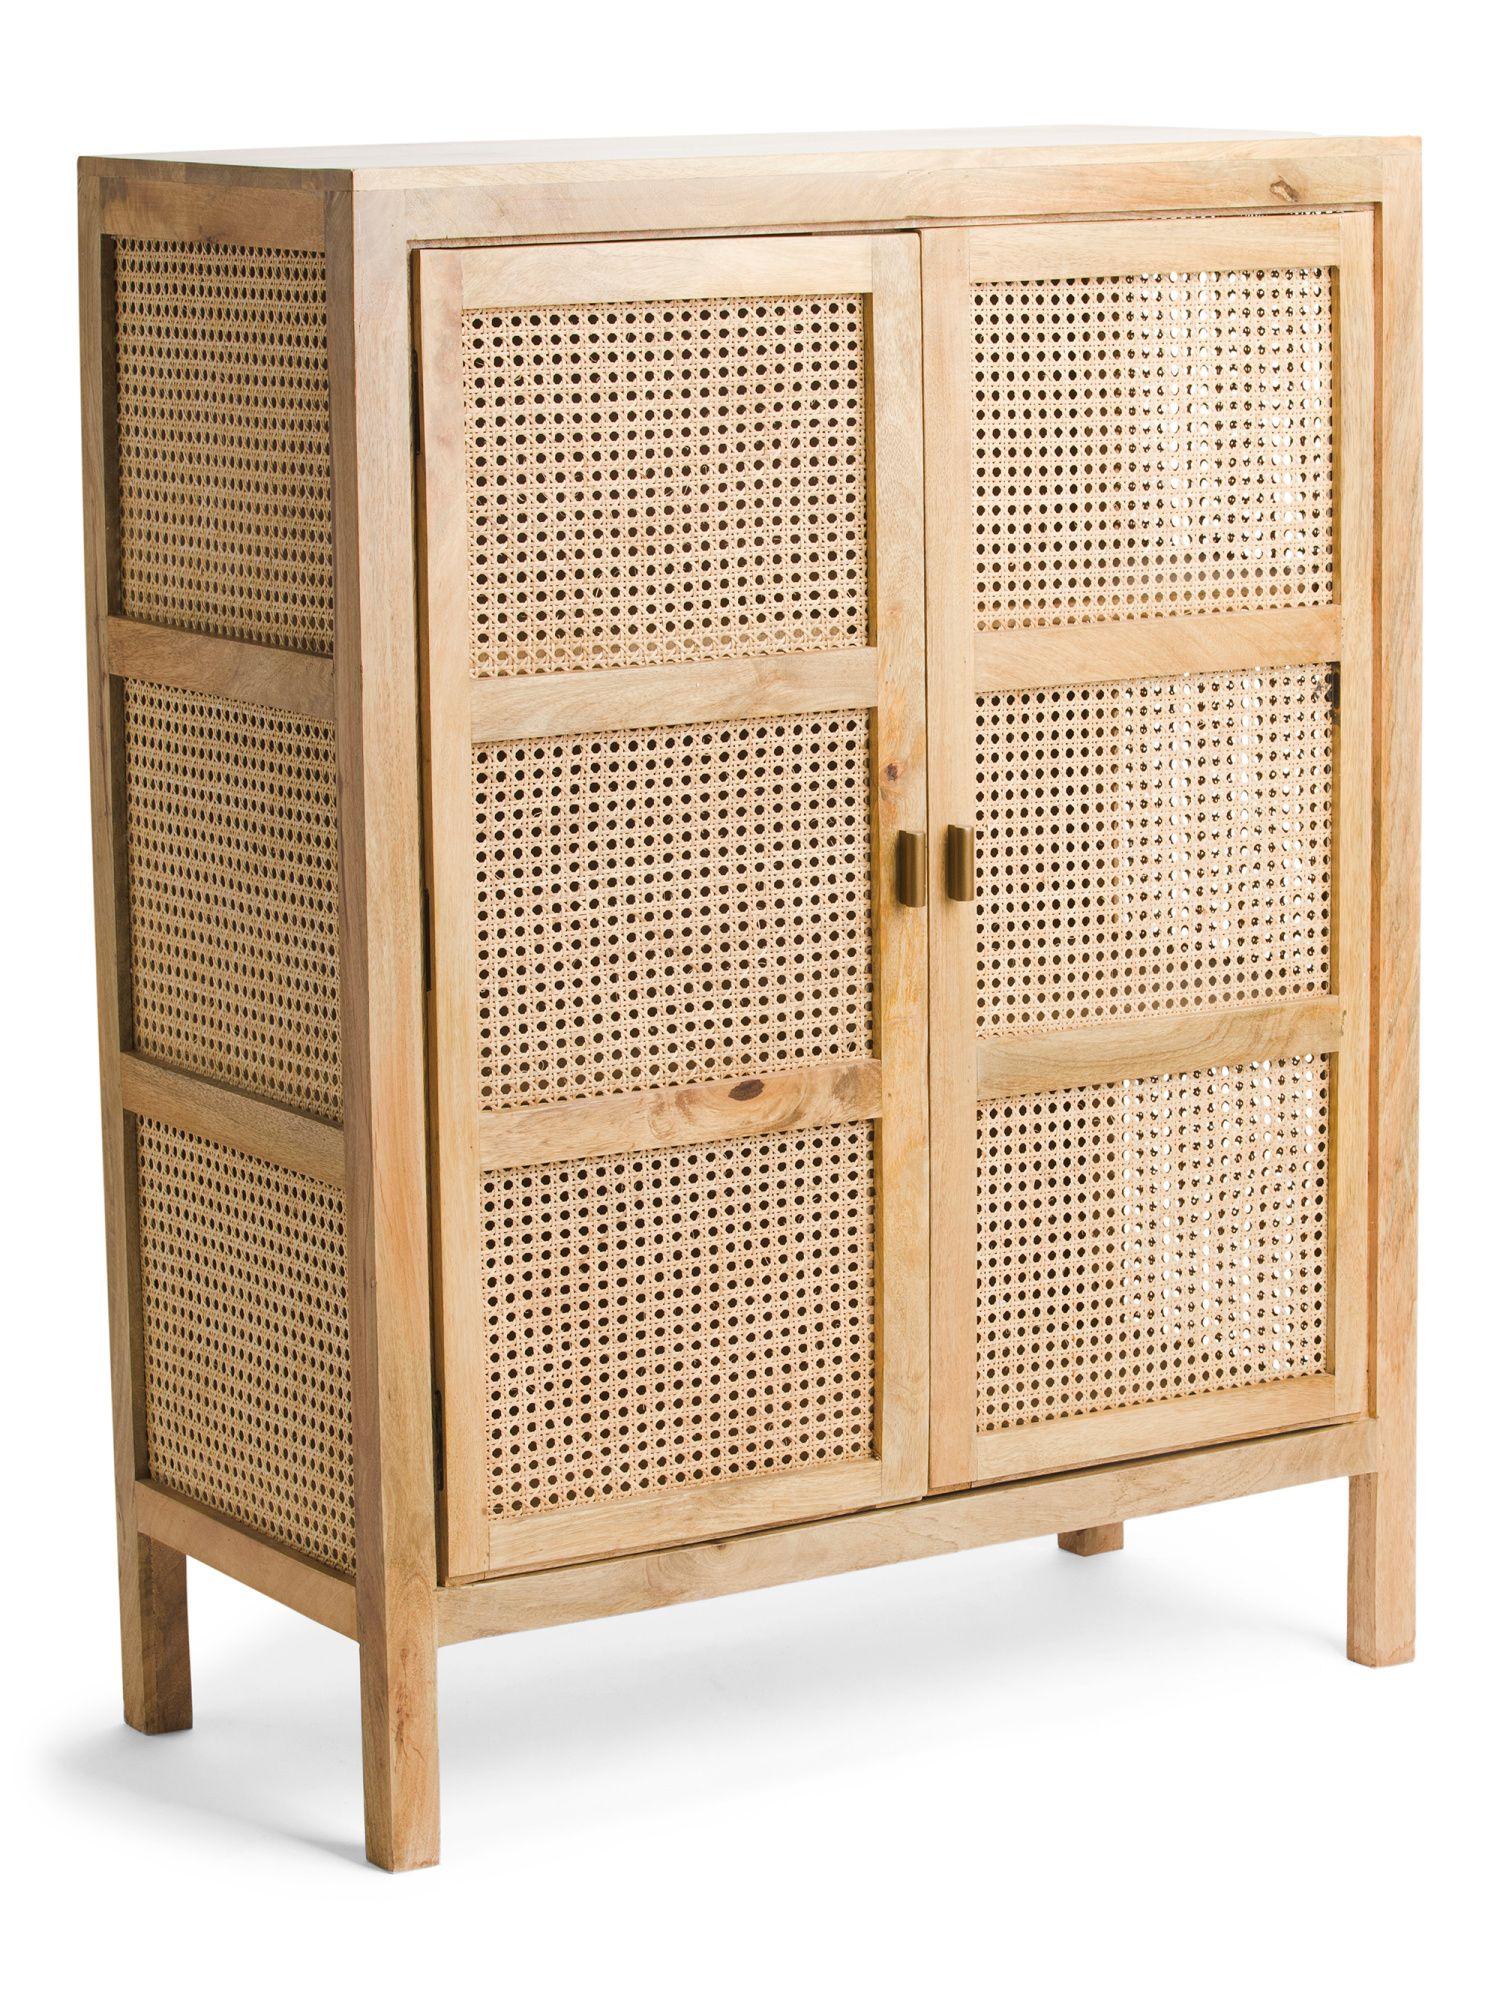 Mango Wood Cane 2 Door Cabinet Accent Furniture T J Maxx Furniture Home Decor Furniture Home Decor Inspiration